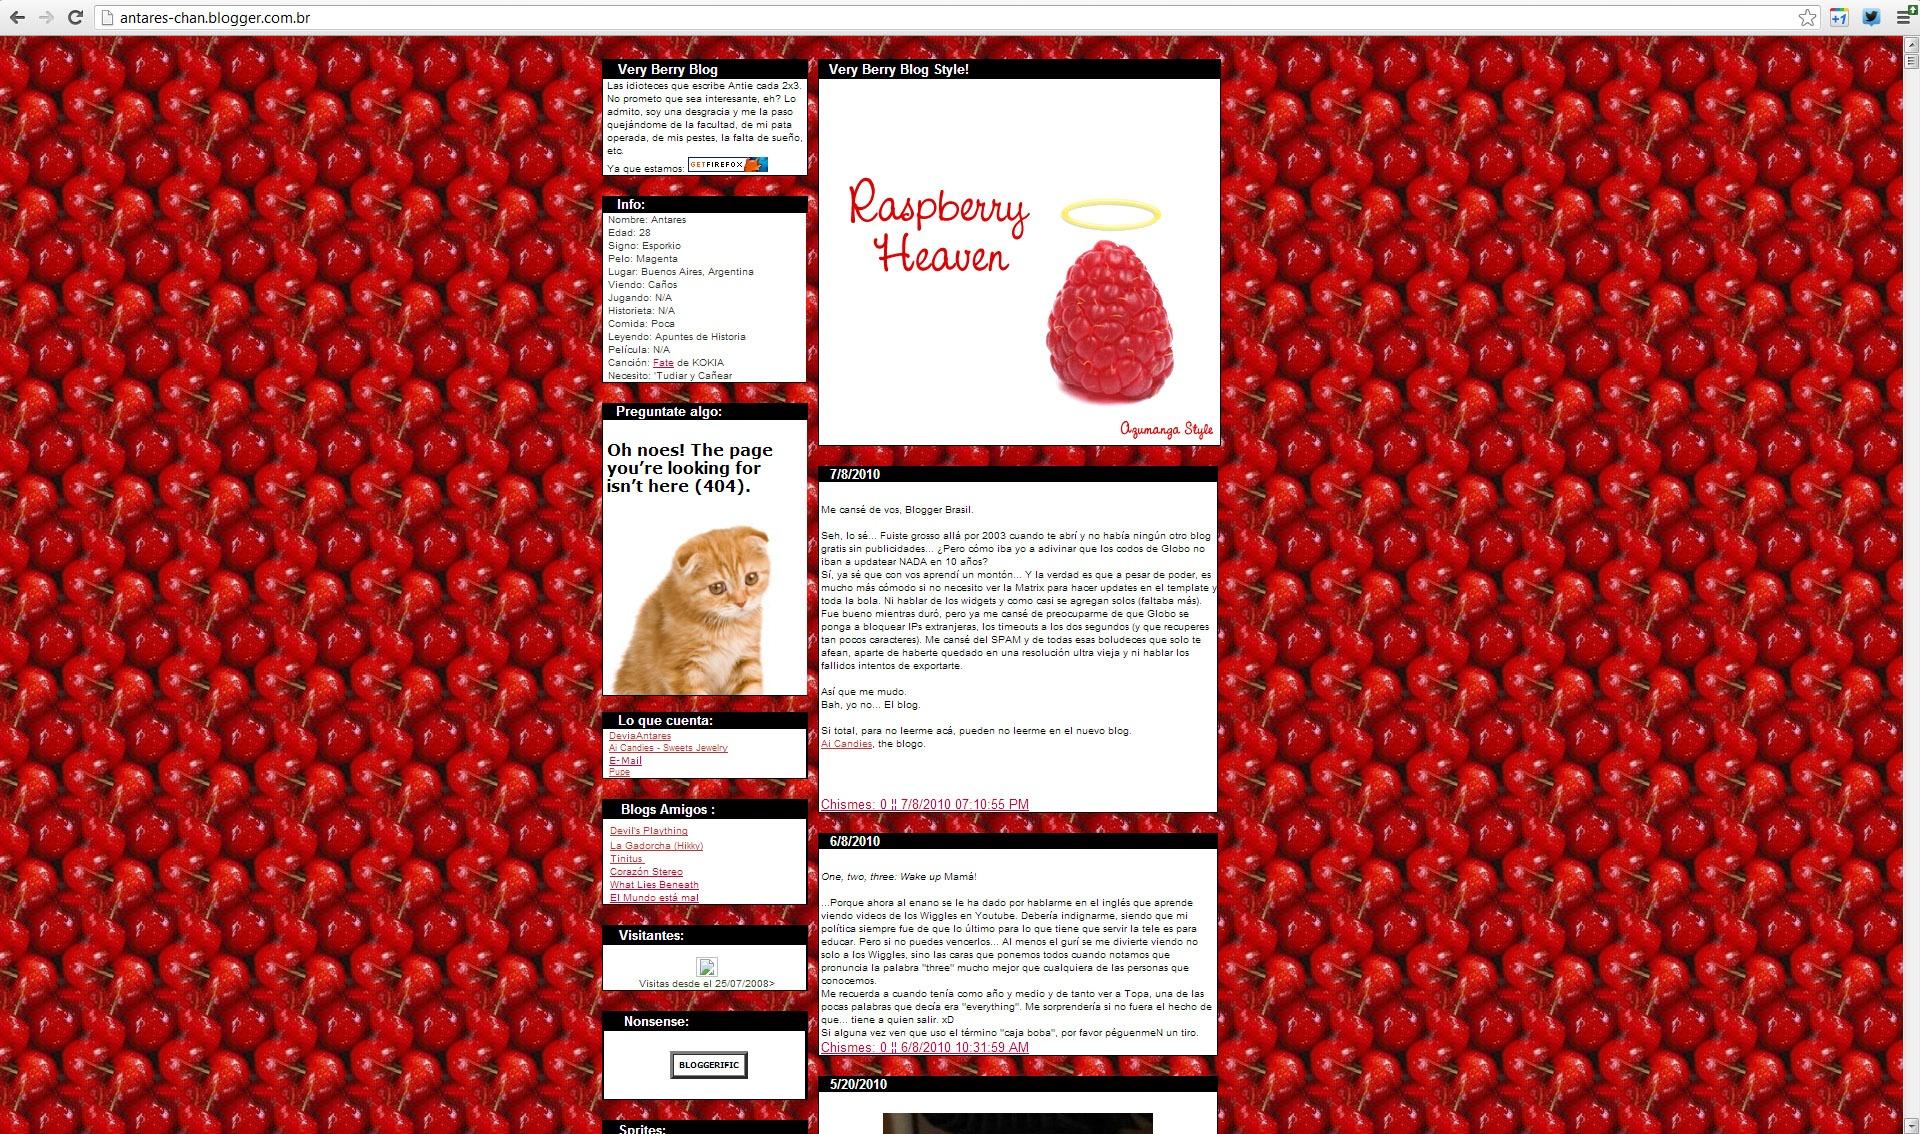 Very Berry Blog